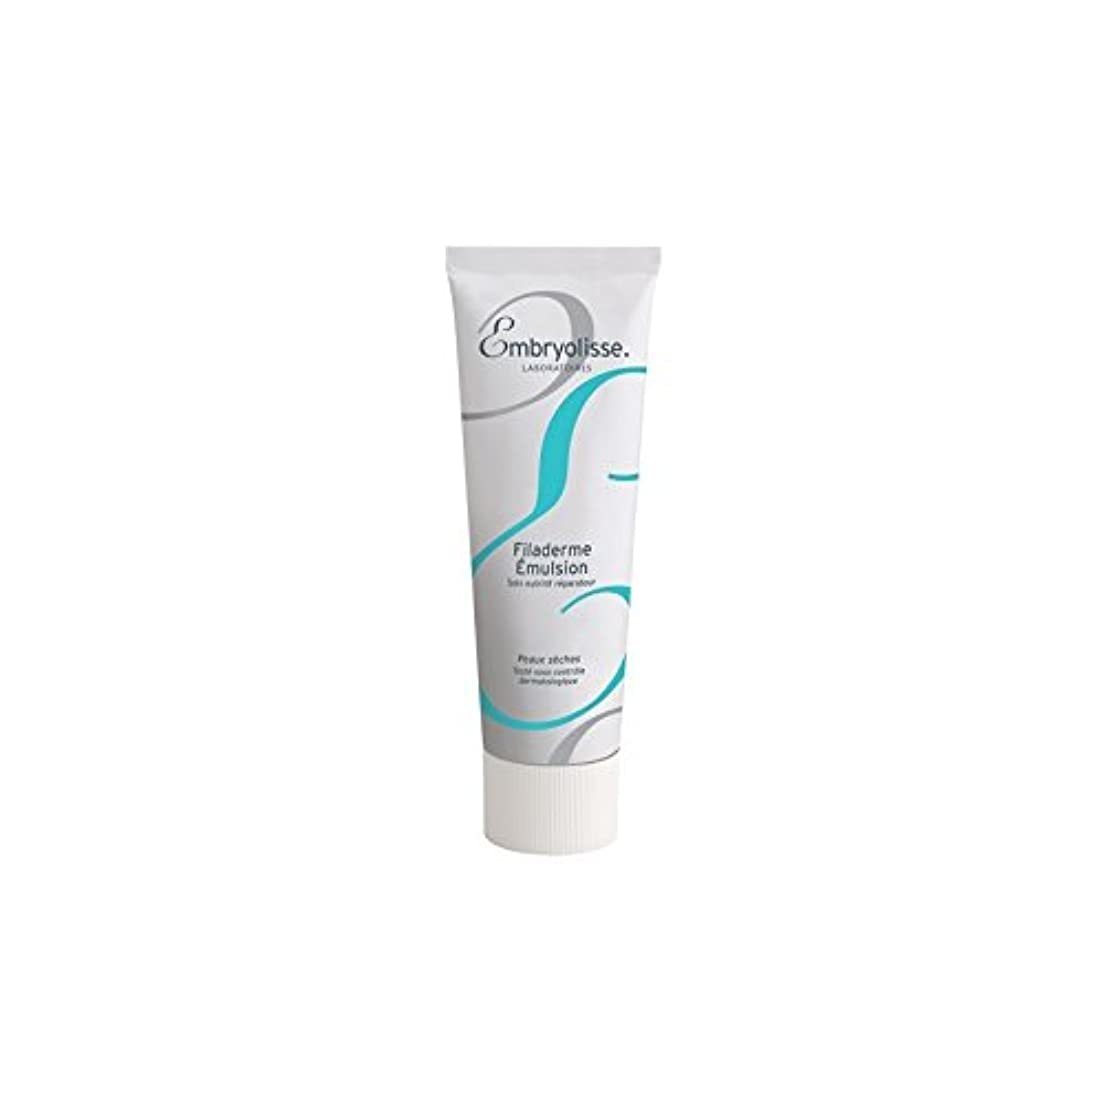 Embryolisse Filaderme Emulsion (75ml) (Pack of 6) - エマルジョン(75ミリリットル) x6 [並行輸入品]